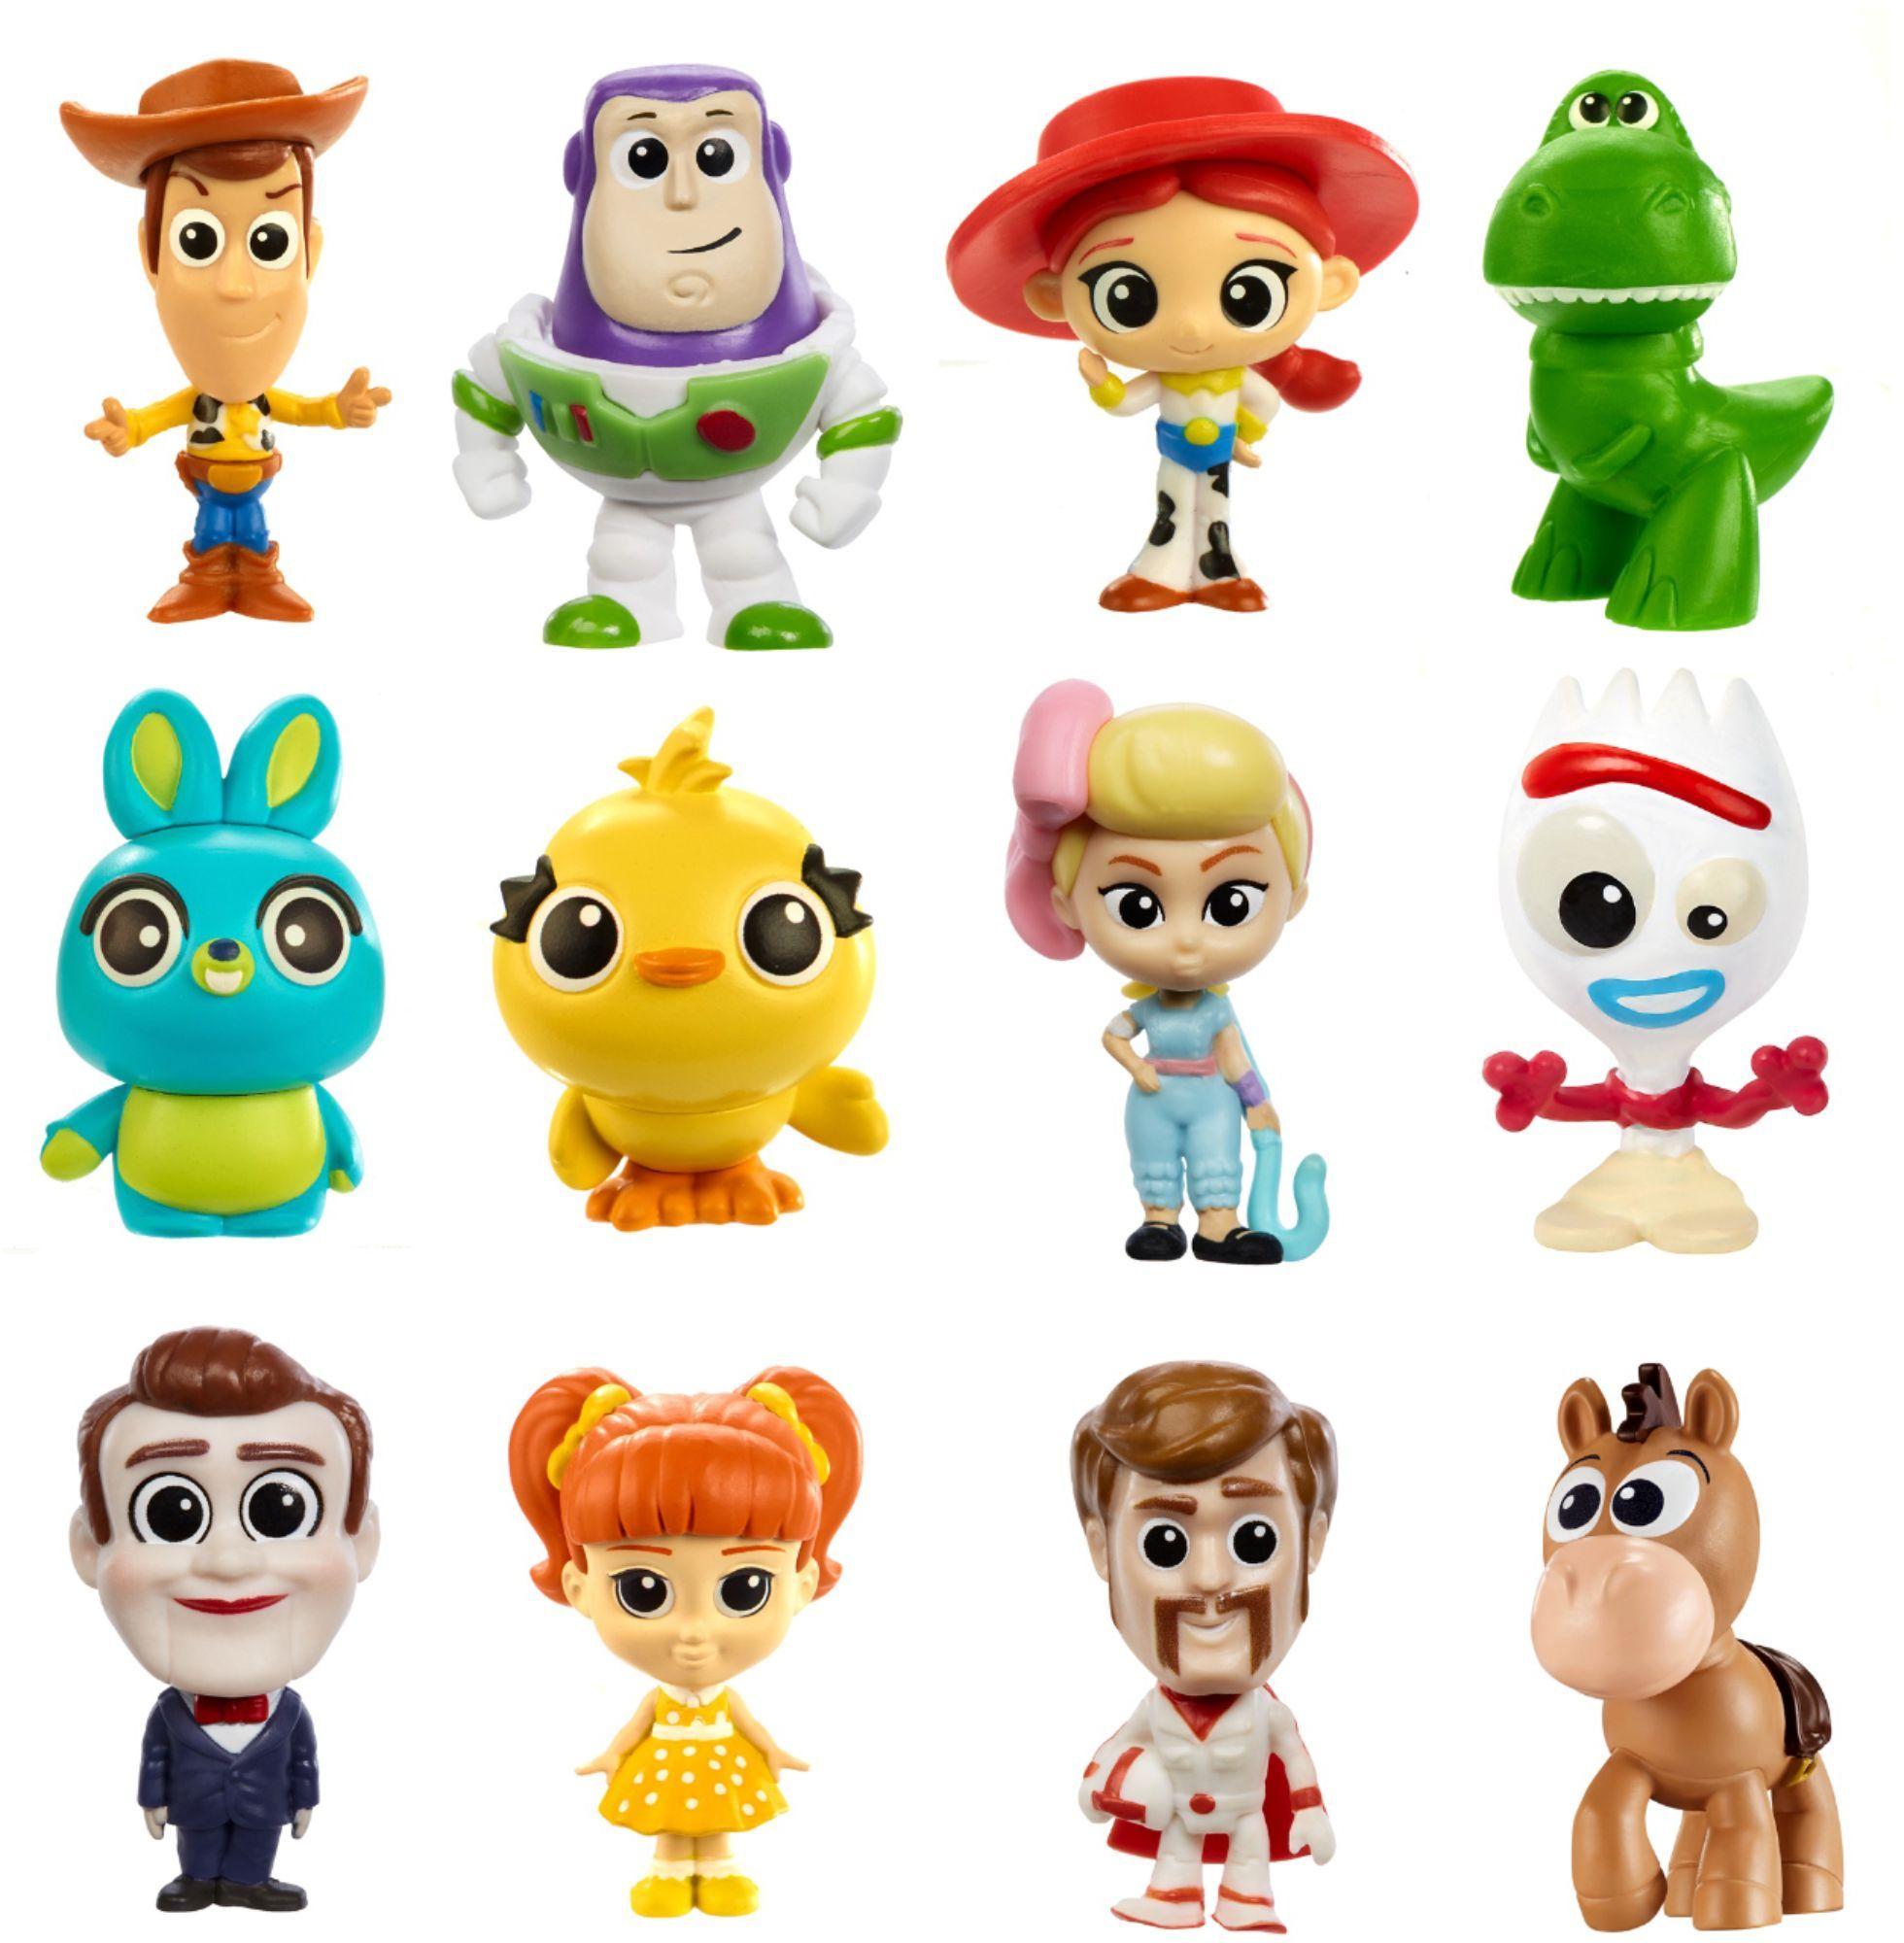 Toy Story 4 Juguetes De Toy Story Juguetes Animados Juguetes De Disney